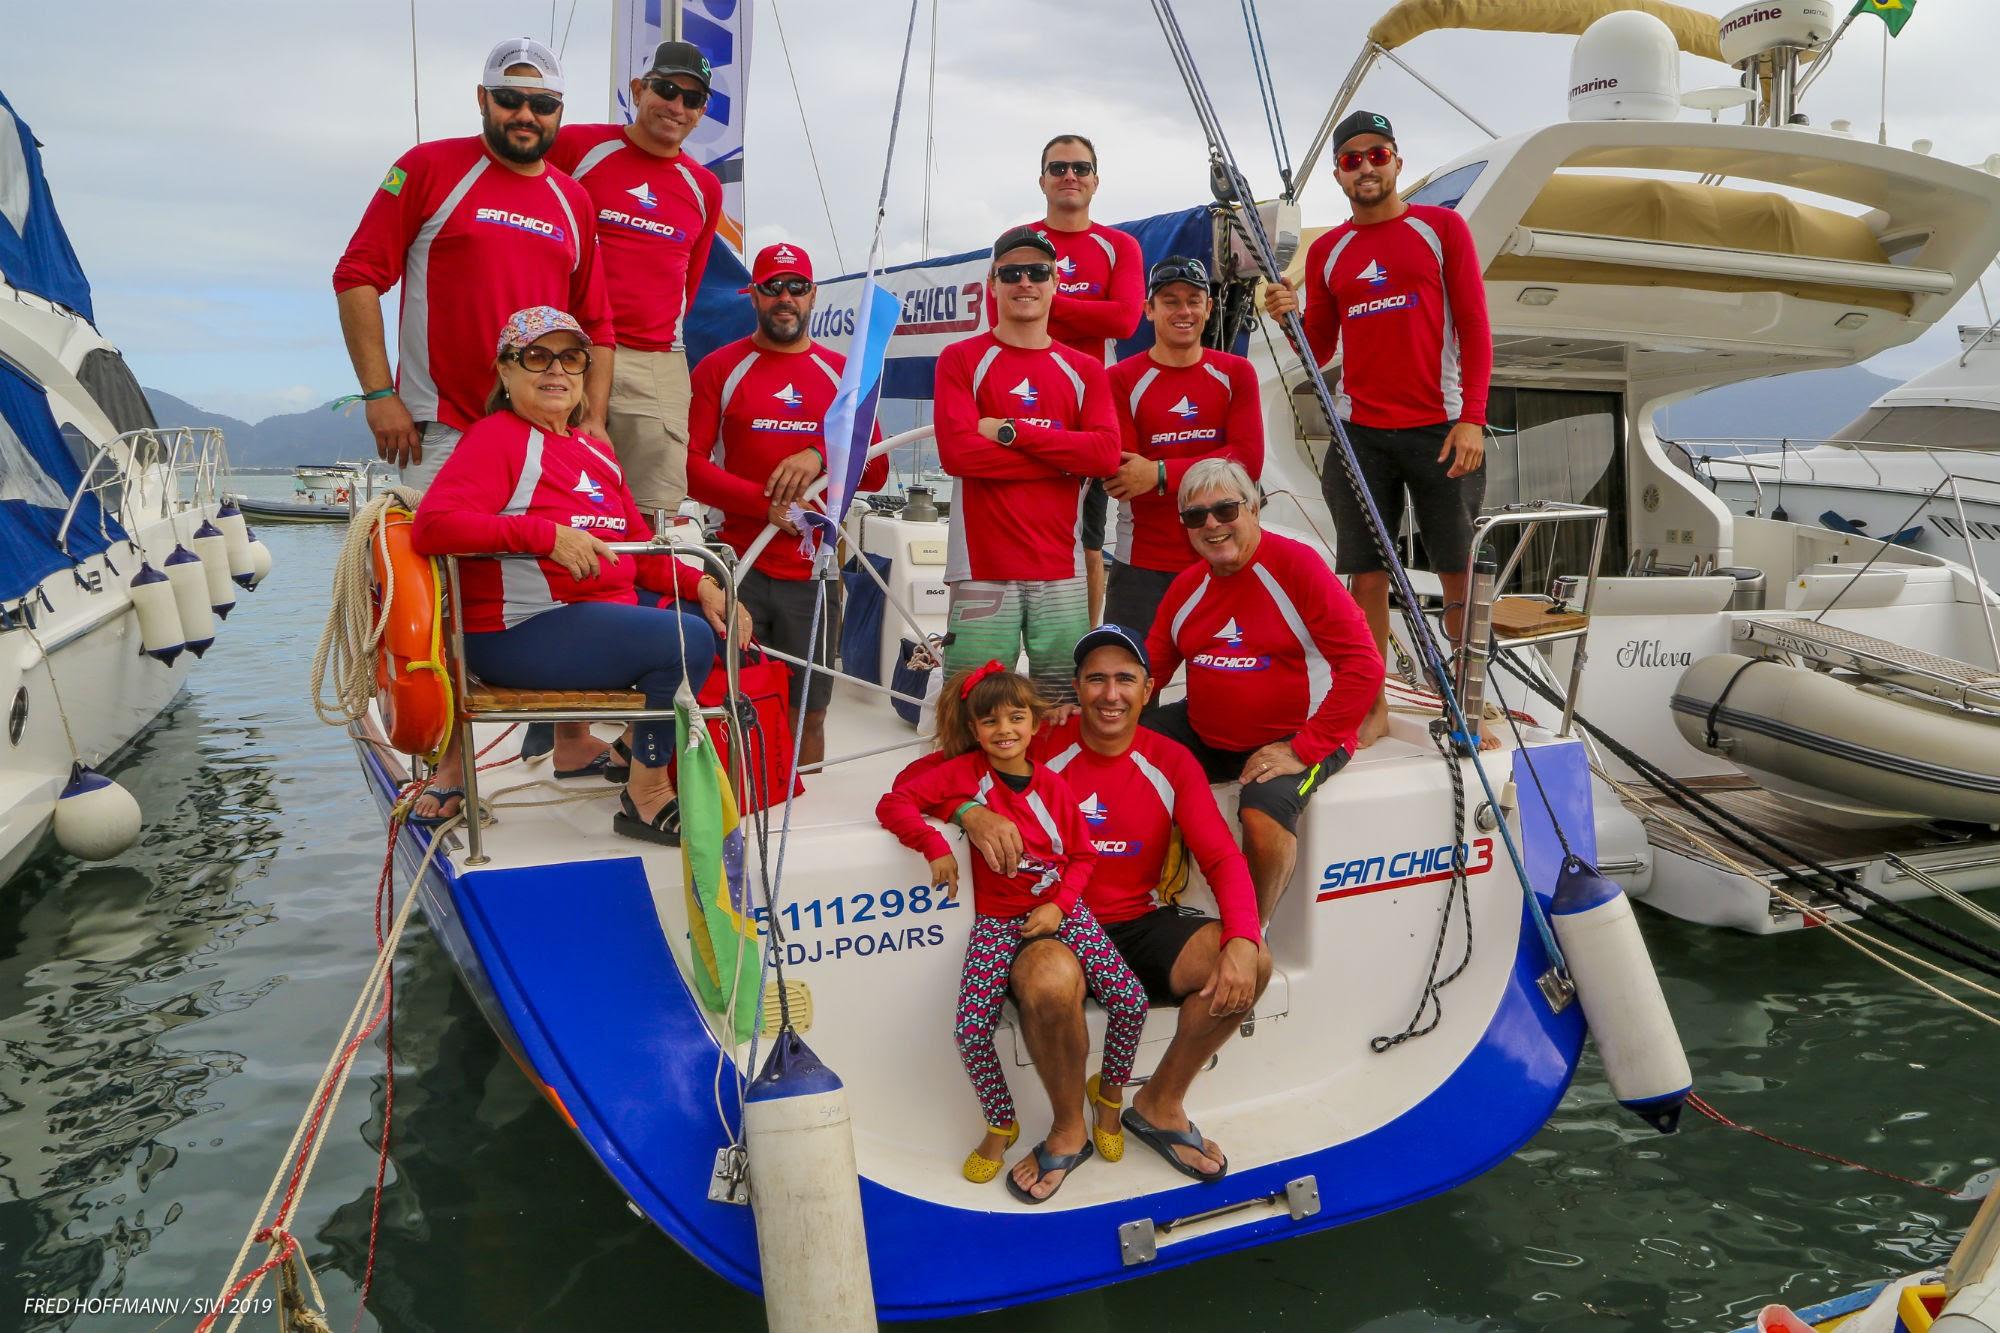 Janga Sail Talks Live destaca a trajetória náutica da família San Chico